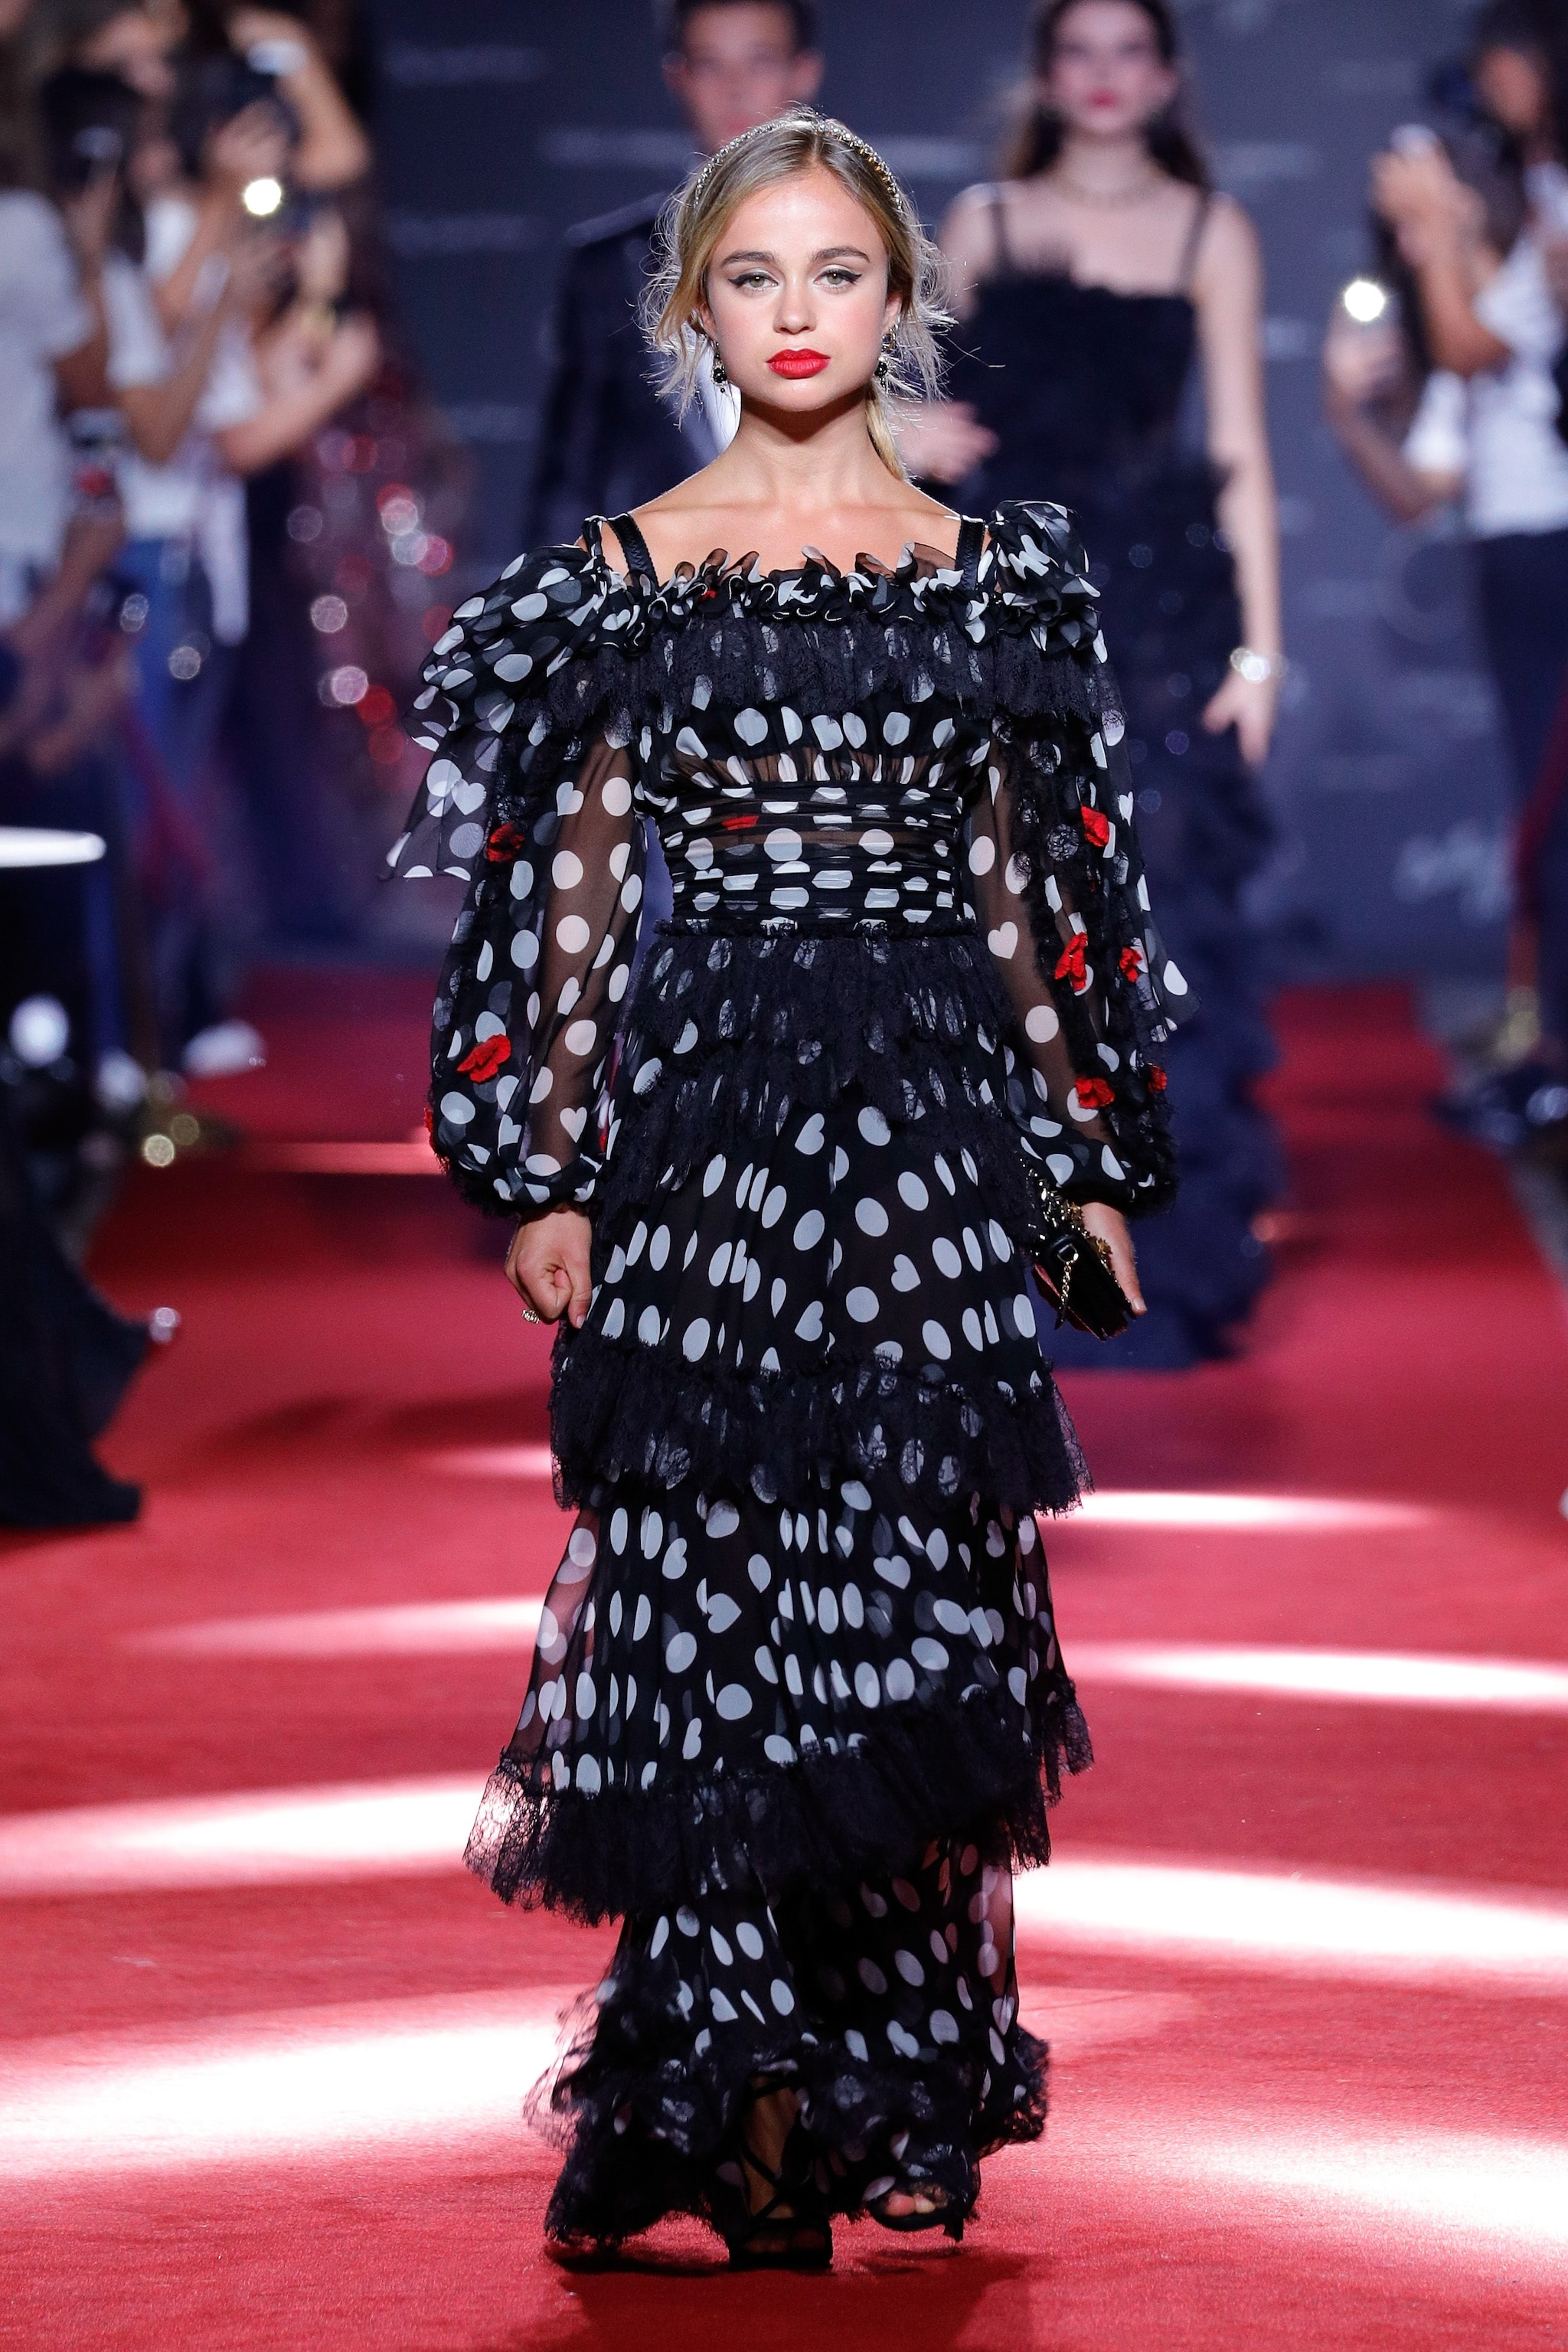 Amelia sfila per Dolce&Gabbana